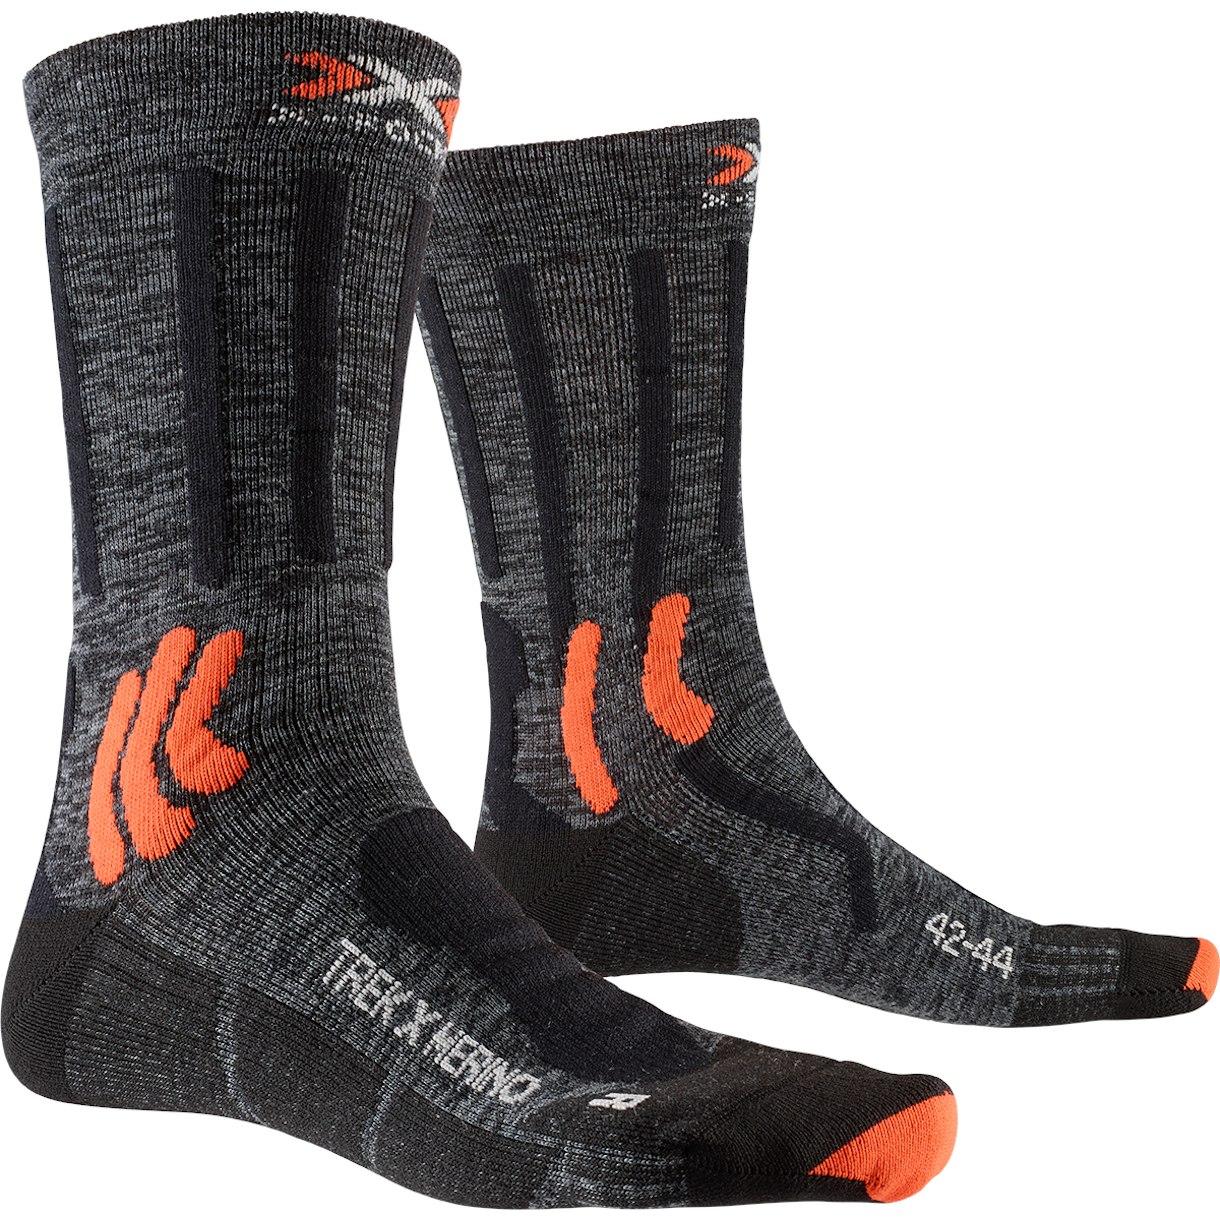 Bild von X-Socks Trek X Merino Socken - grey duo melange/x-orange/black